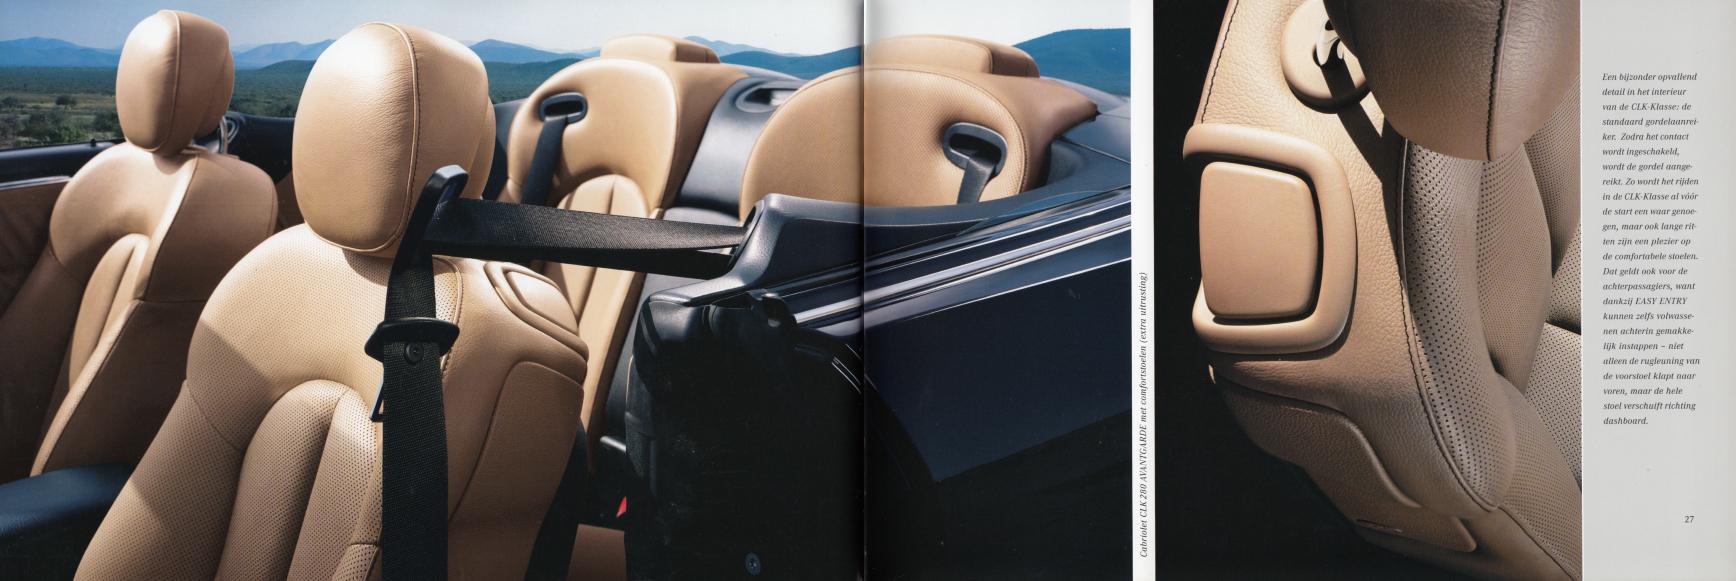 (A/C209): Catálogo 2006 - neerlandês 014